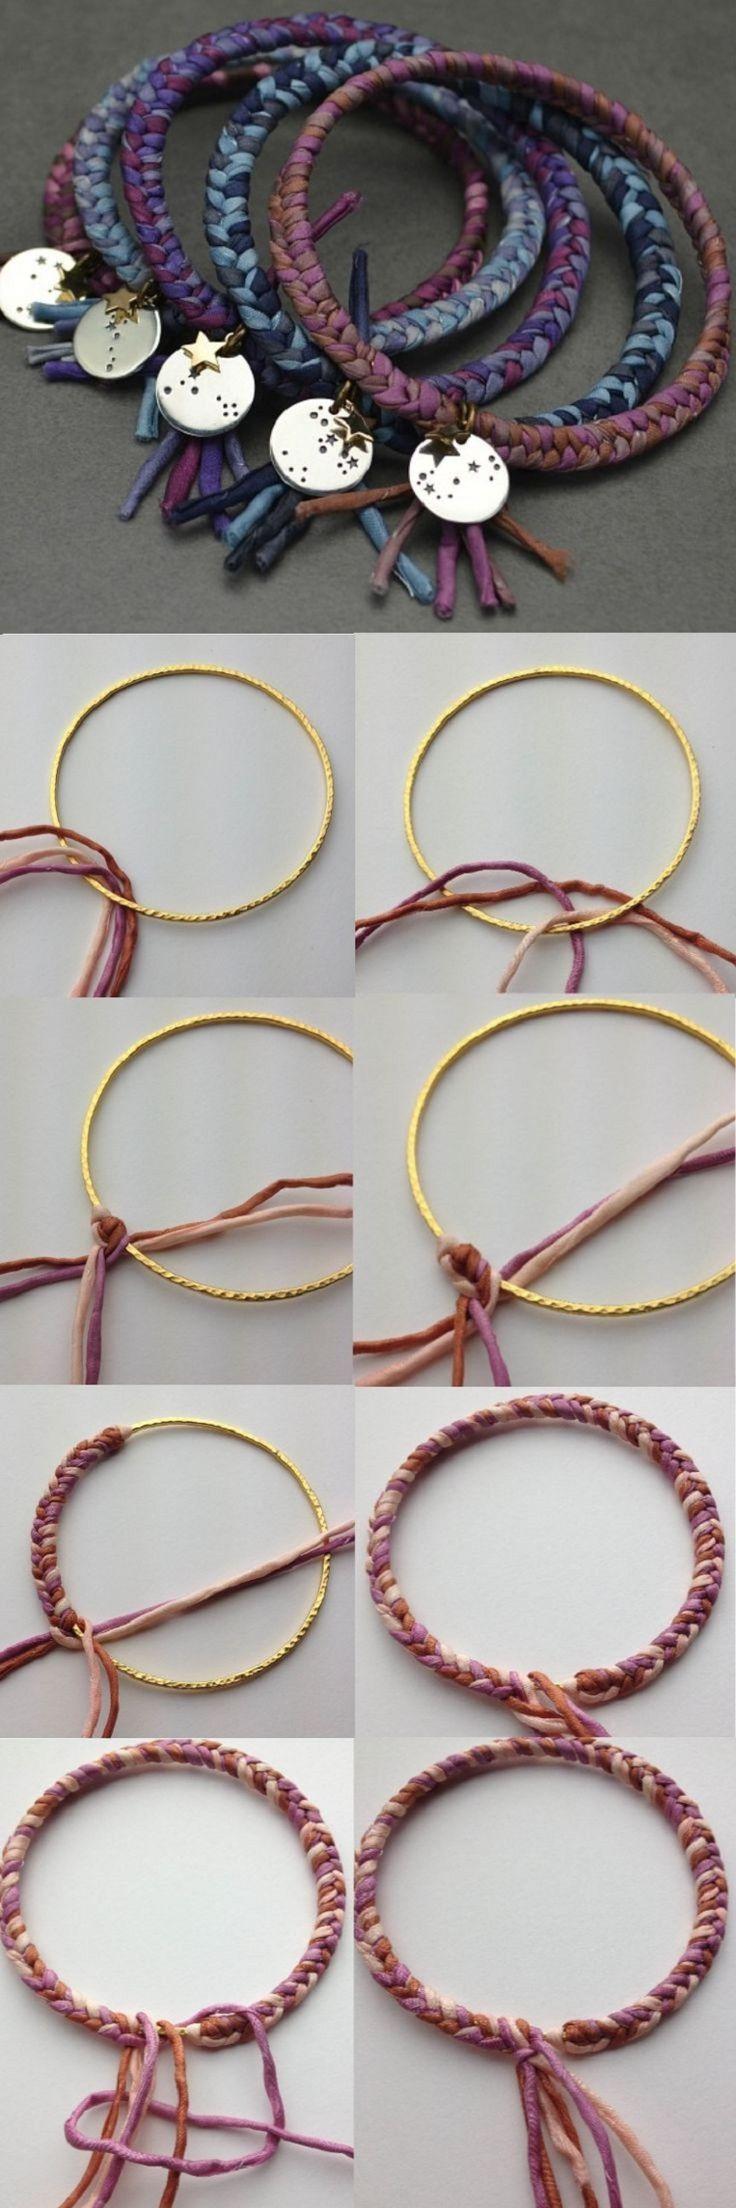 Diy colorful braided bangle diy felting crochet macramé ceramic